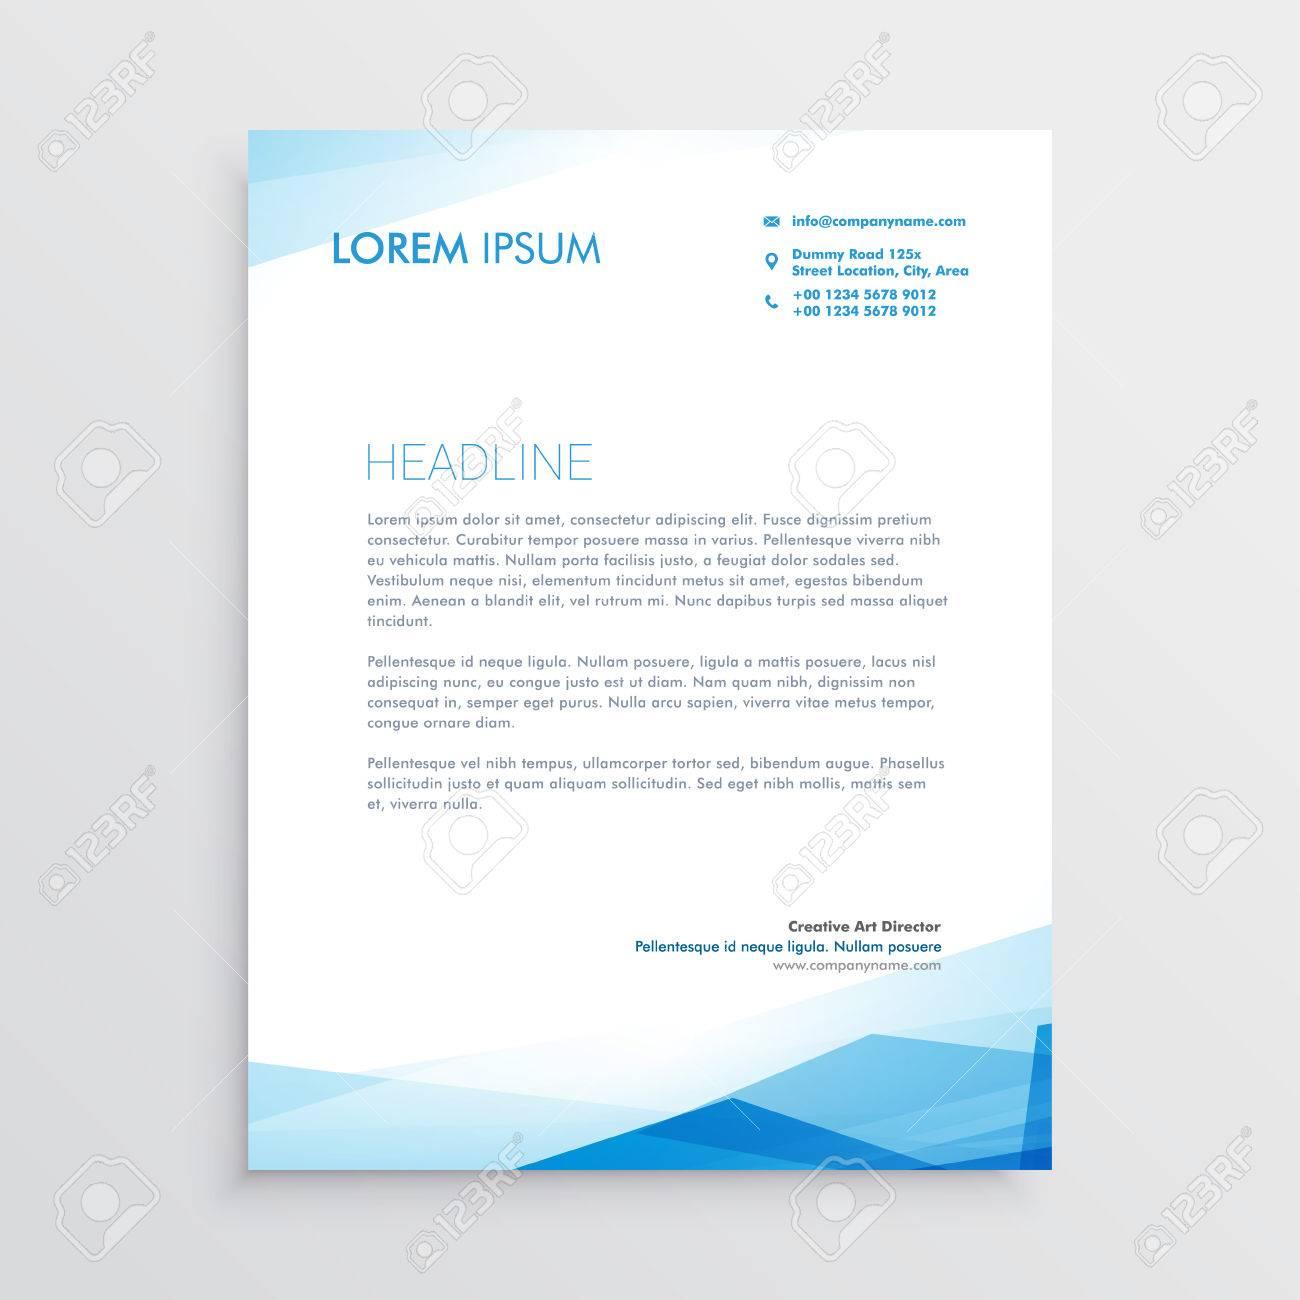 Elegant blue letterhead template design royalty free cliparts elegant blue letterhead template design stock vector 69230922 spiritdancerdesigns Images